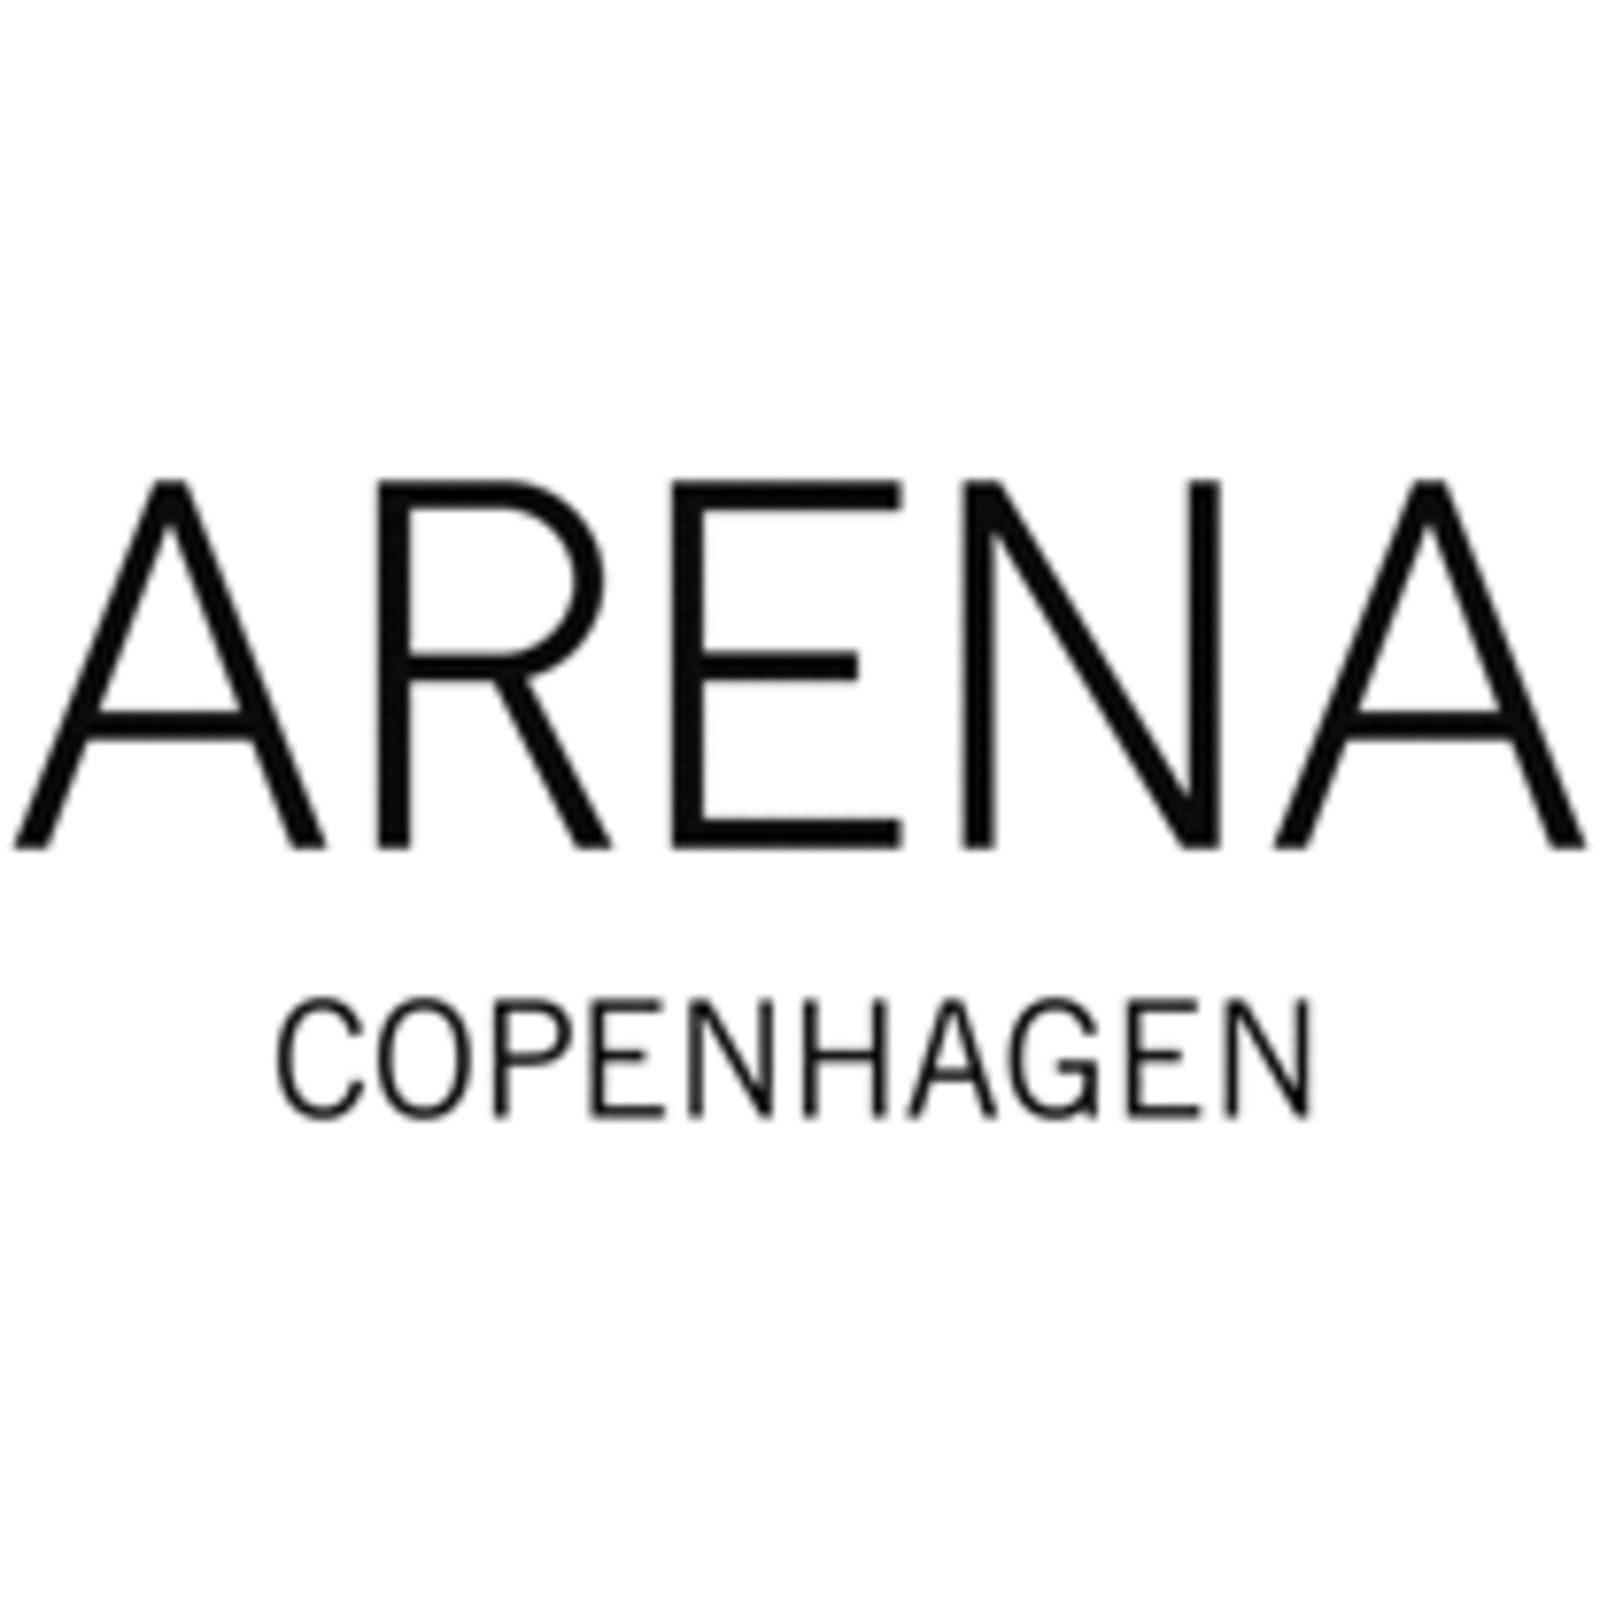 ARENA COPENHAGEN